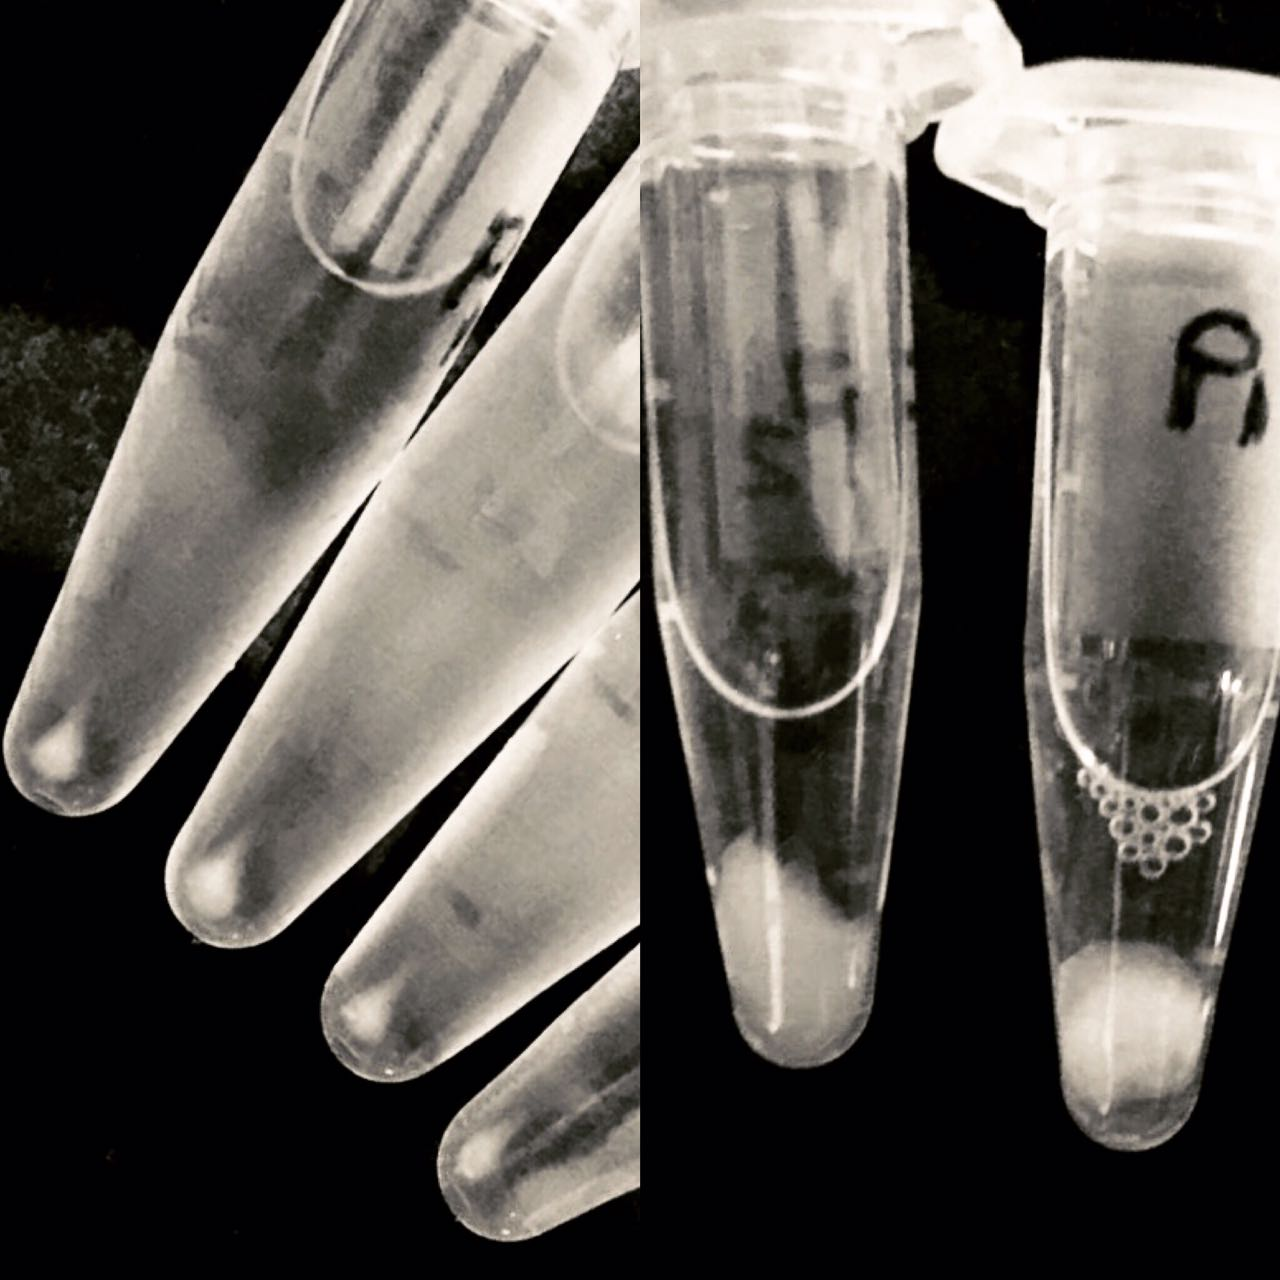 Ethanol precipitated DNA samples.